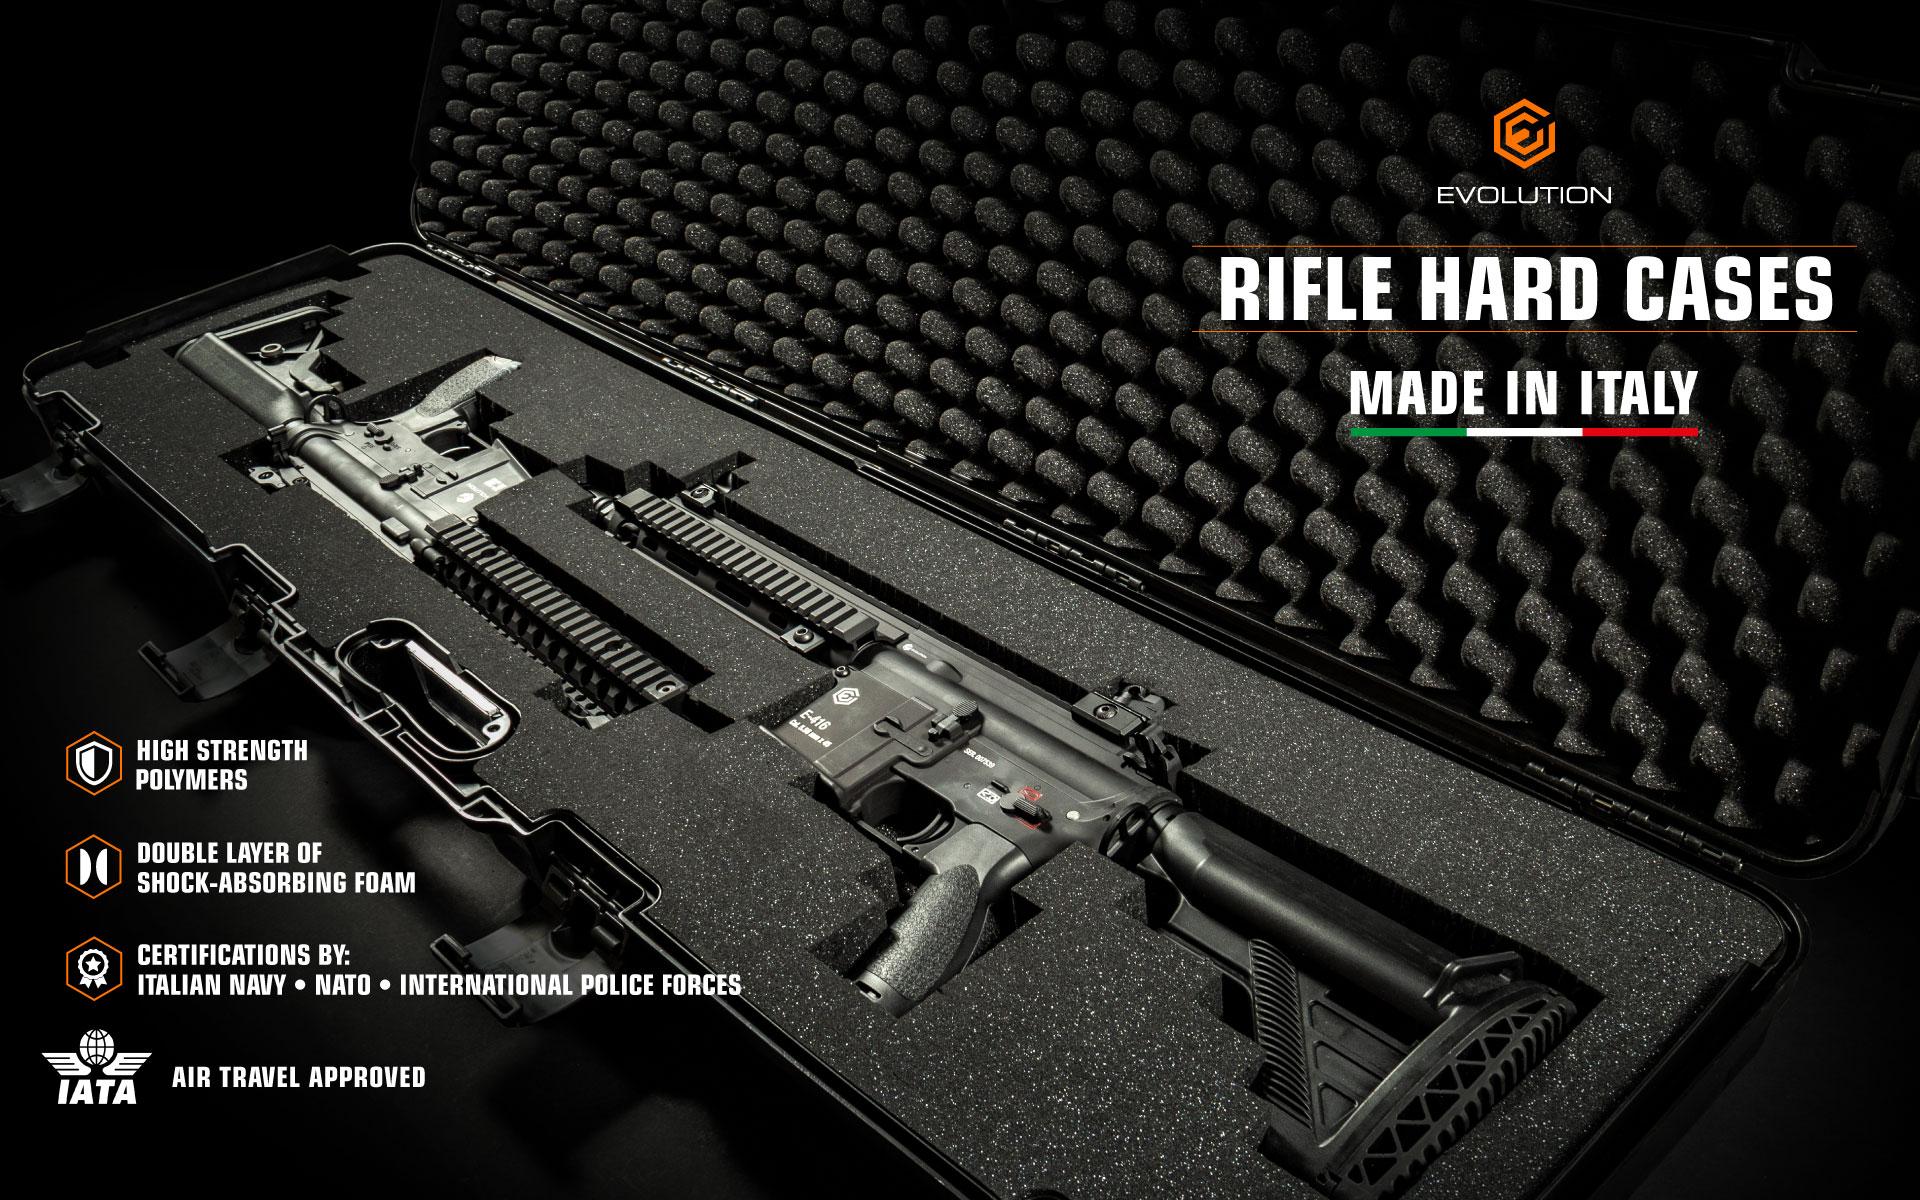 Evolution Rifle Hard Cases